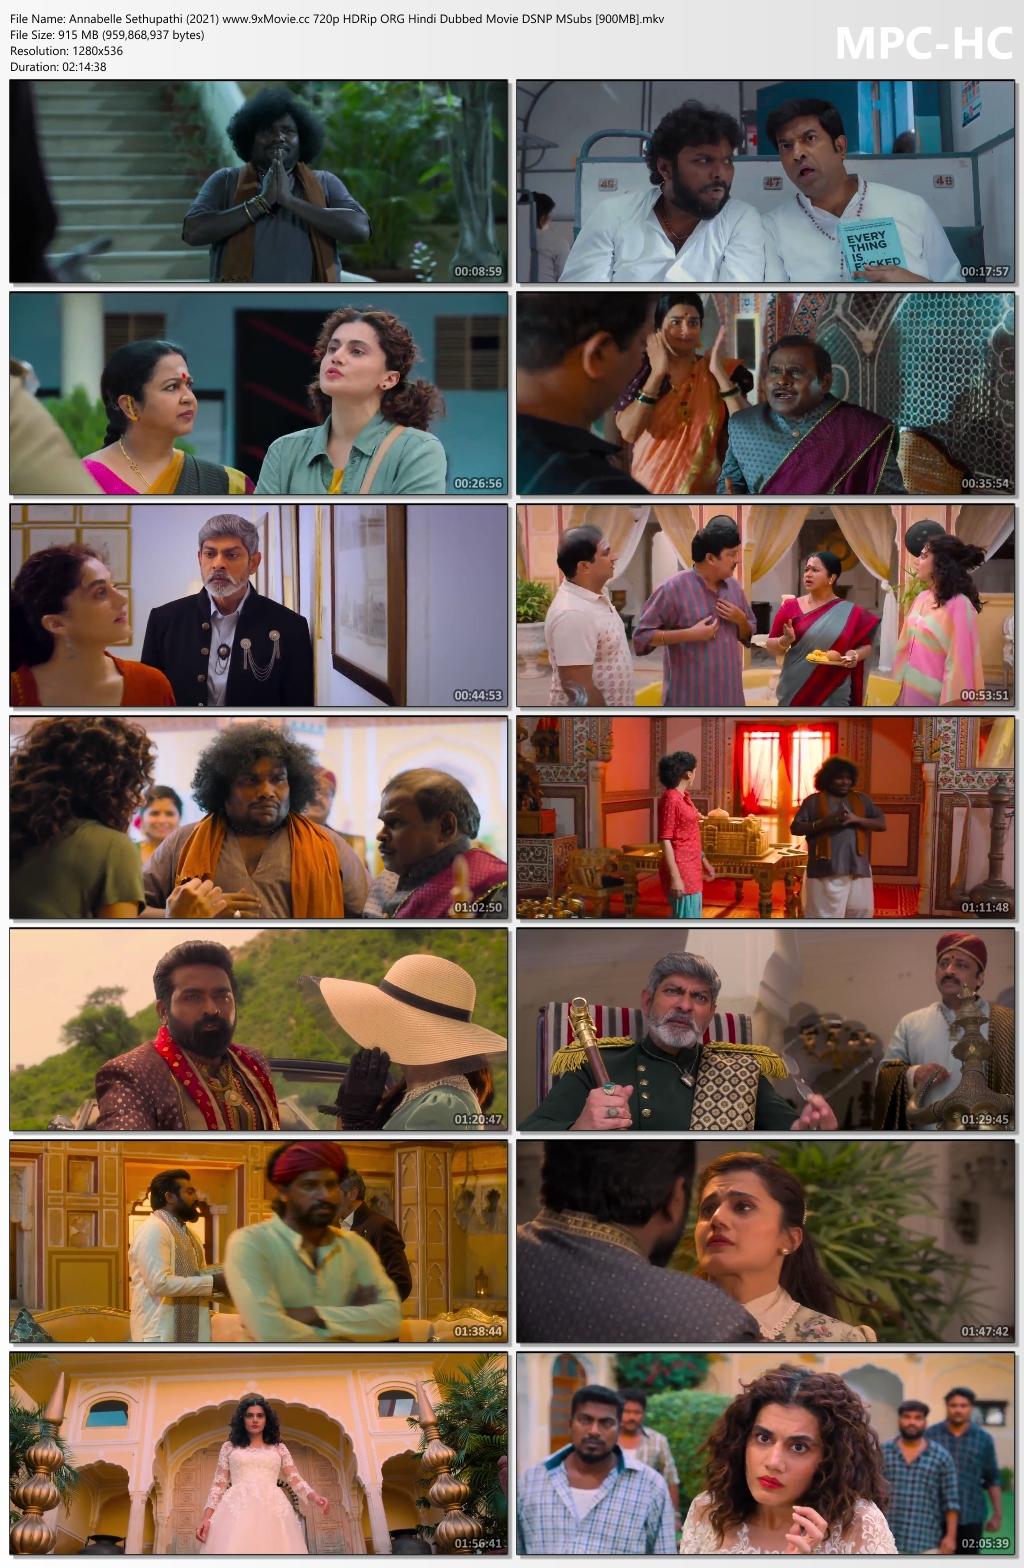 Annabelle-Sethupathi-2021-www-9x-Movie-cc-720p-HDRip-ORG-Hindi-Dubbed-Movie-DSNP-MSubs-900-MB-mkv